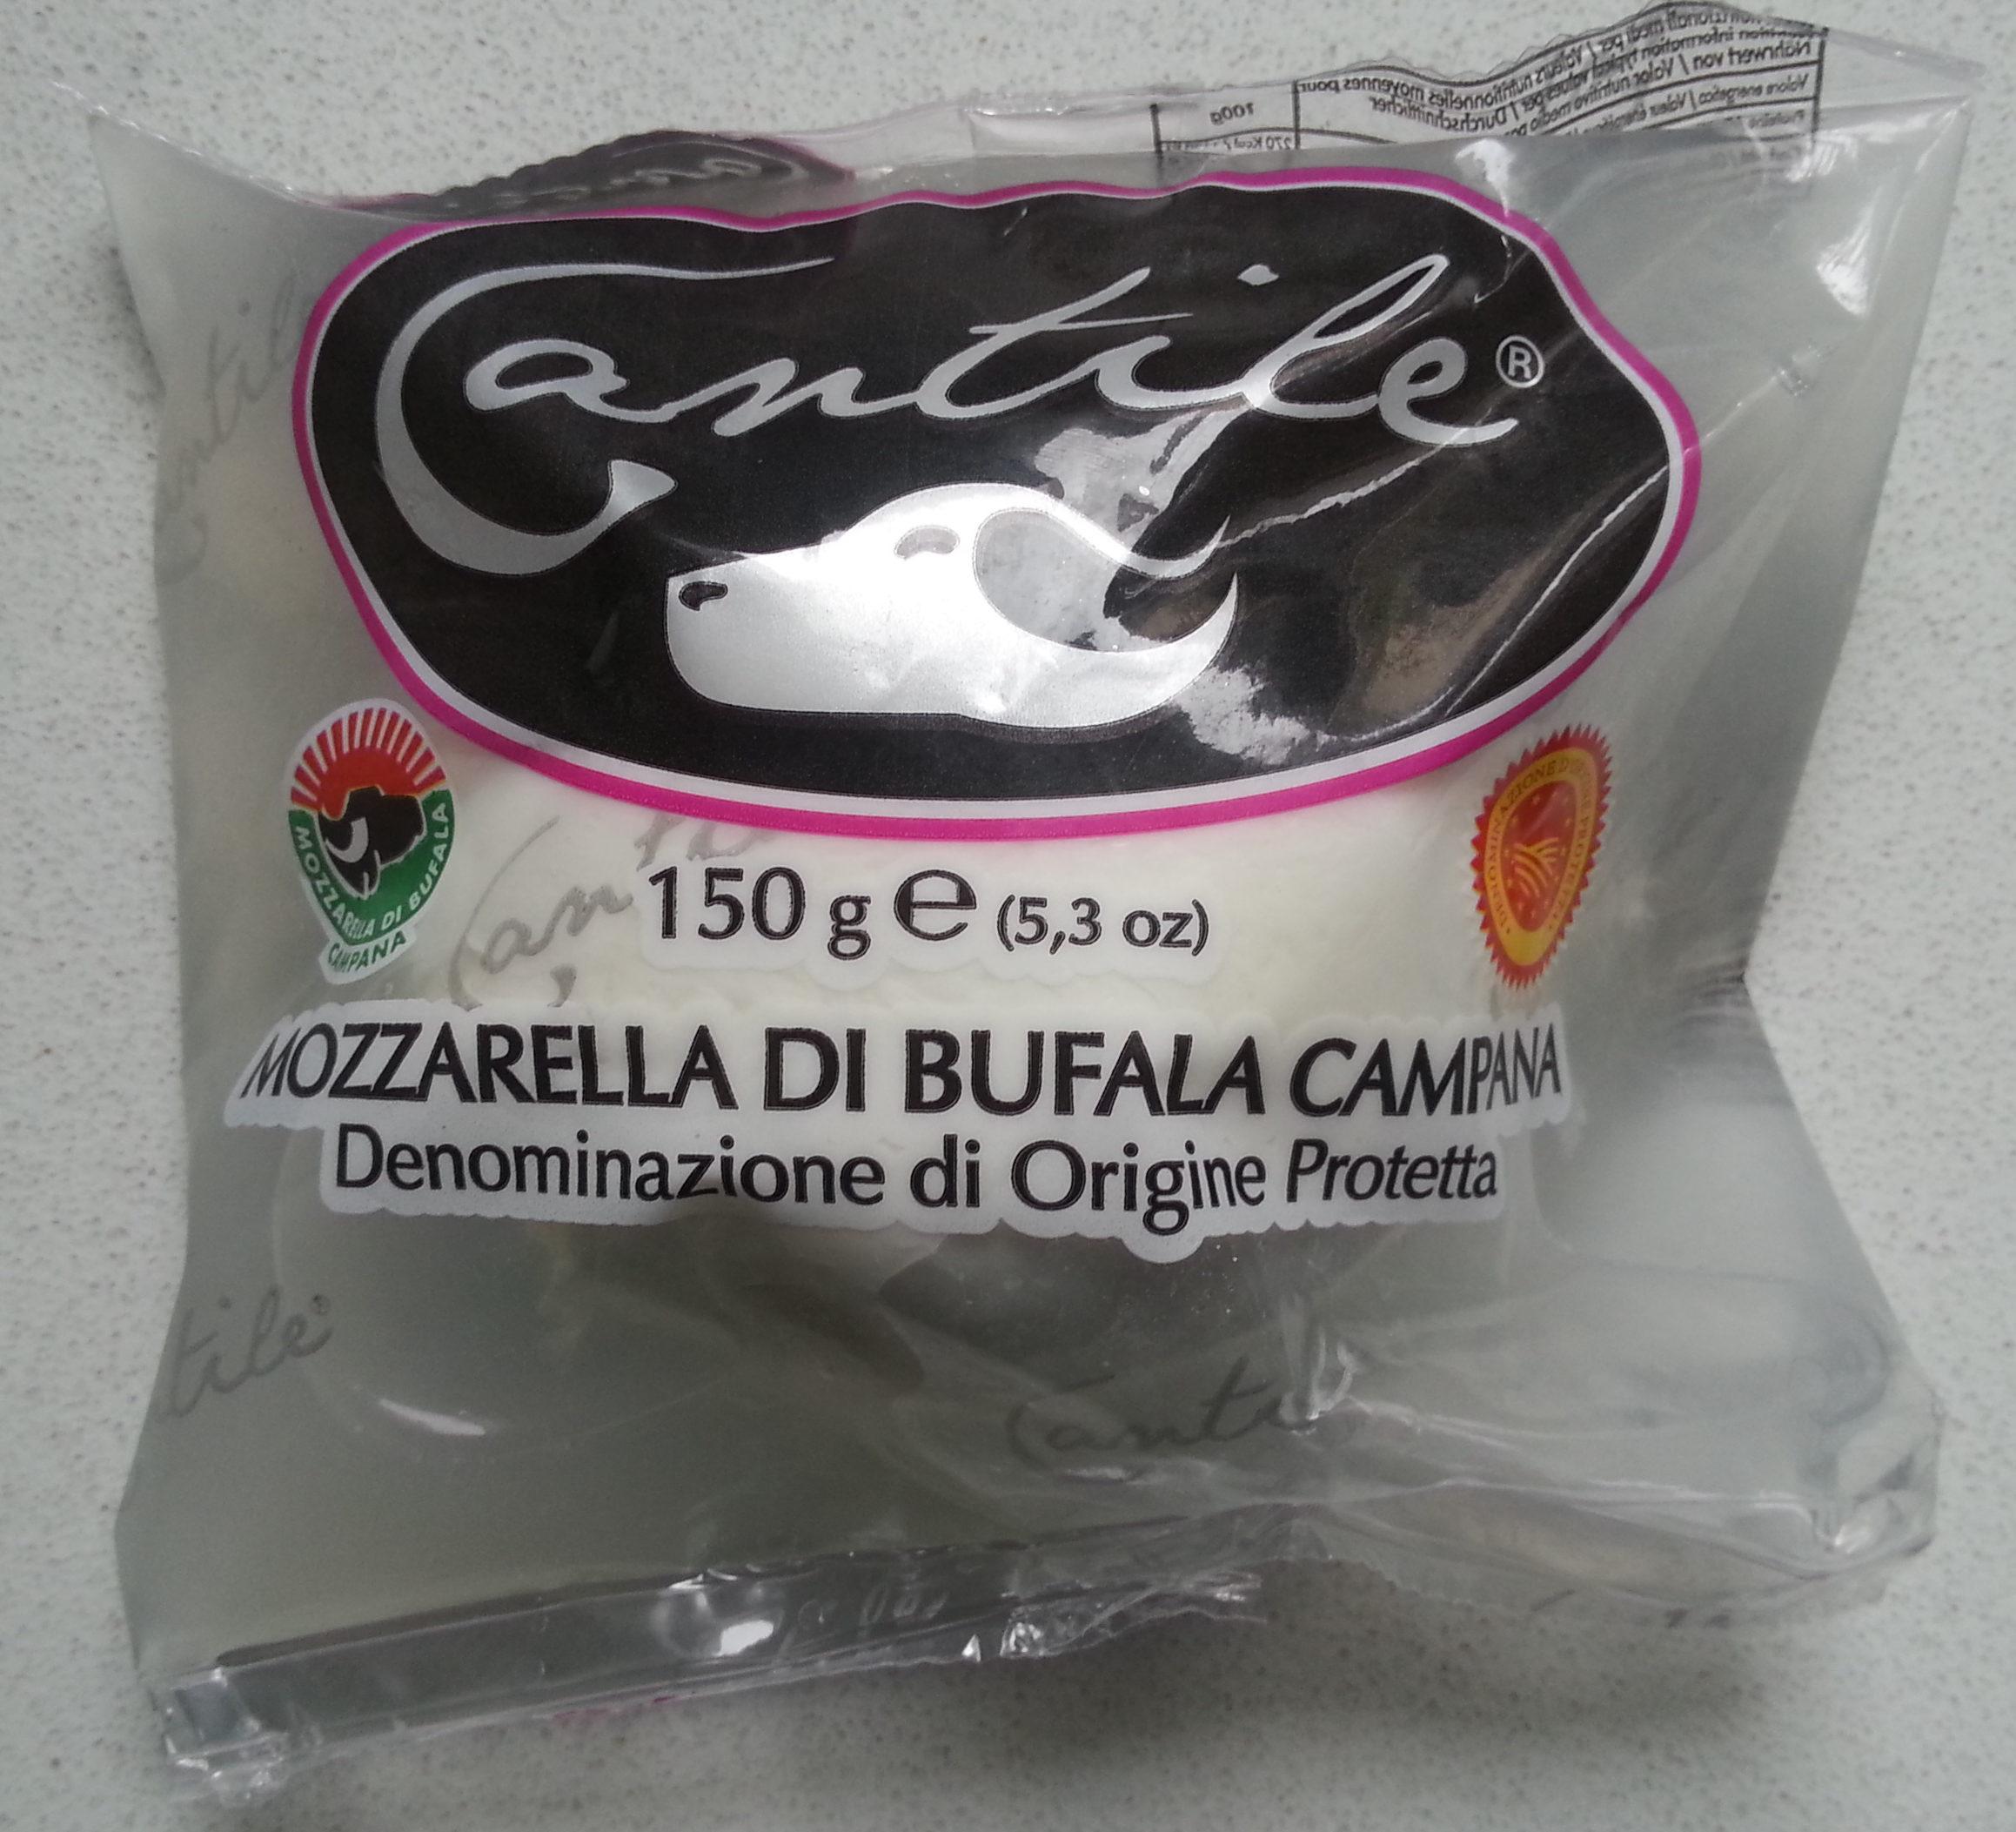 Mozzarella di Bufala Campana AOP - 240 g - Cantile - Product